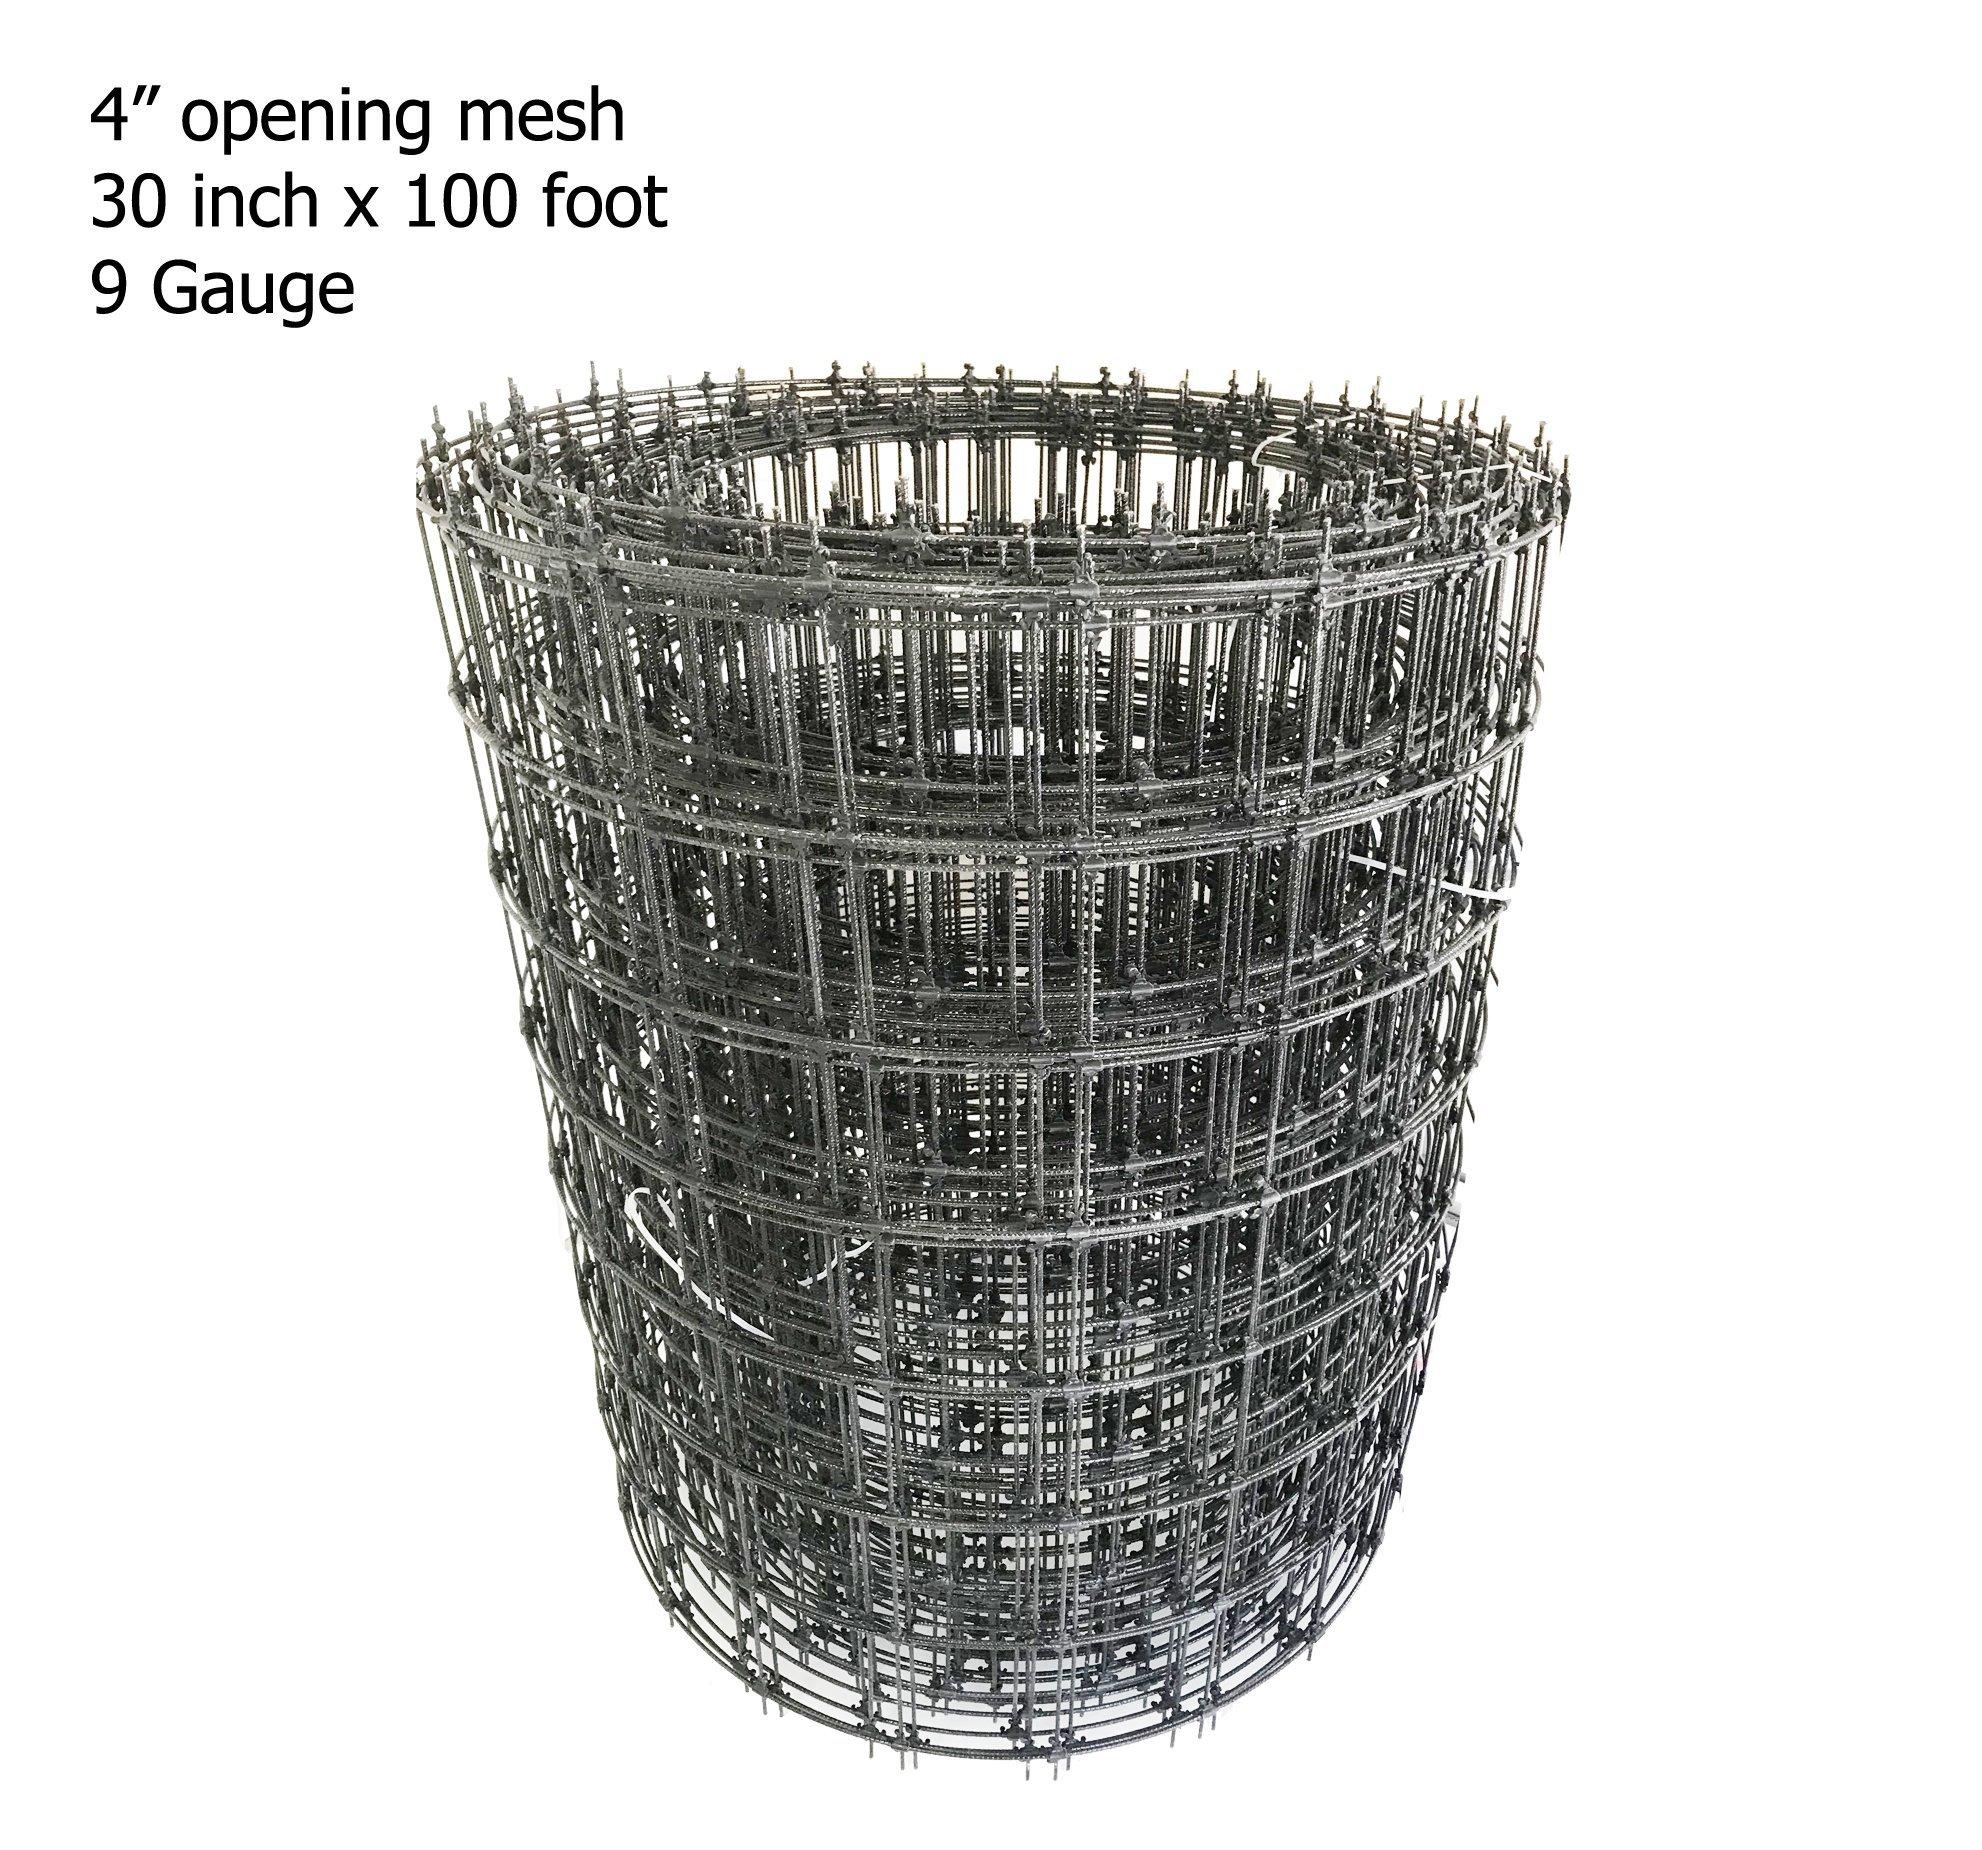 Galen Panamerica 9 Gauge Fiberglass Wire Mesh 30'' x 100' - 4'' Square